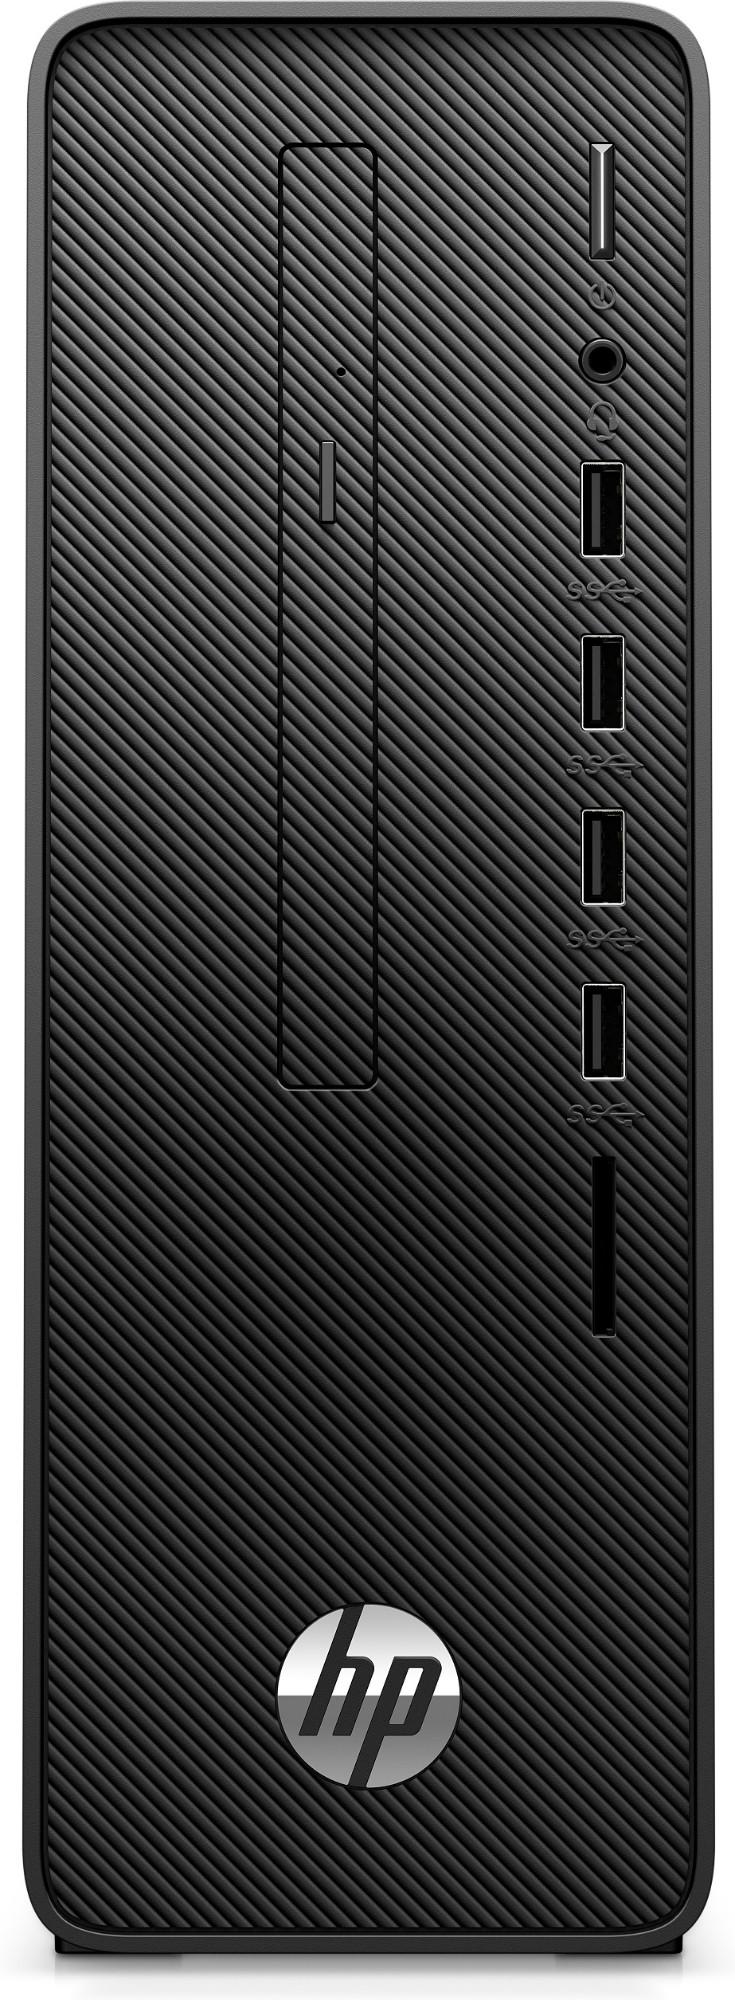 HP 290 G3 Intel® Core™ i3 de 10ma Generación i3-10110U 8 GB DDR4-SDRAM 256 GB SSD SFF Negro PC Windows 10 Pro